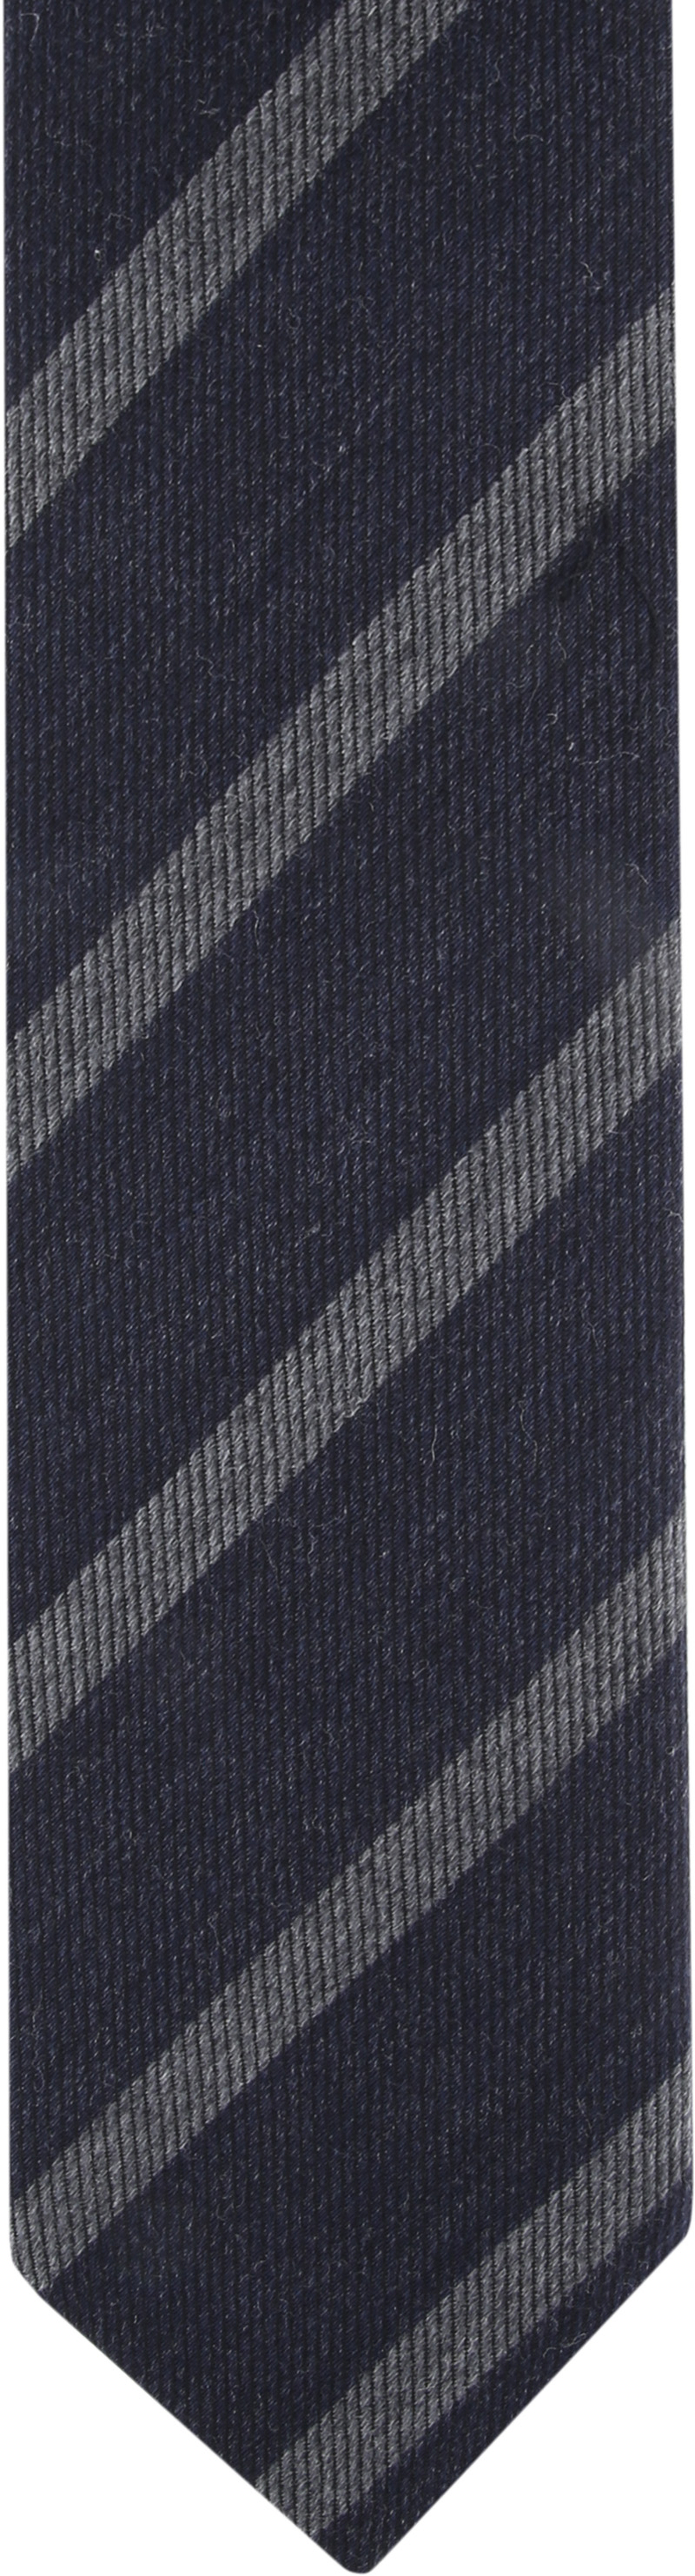 Suitable Krawatte Streifen Dunkelgrau Foto 1